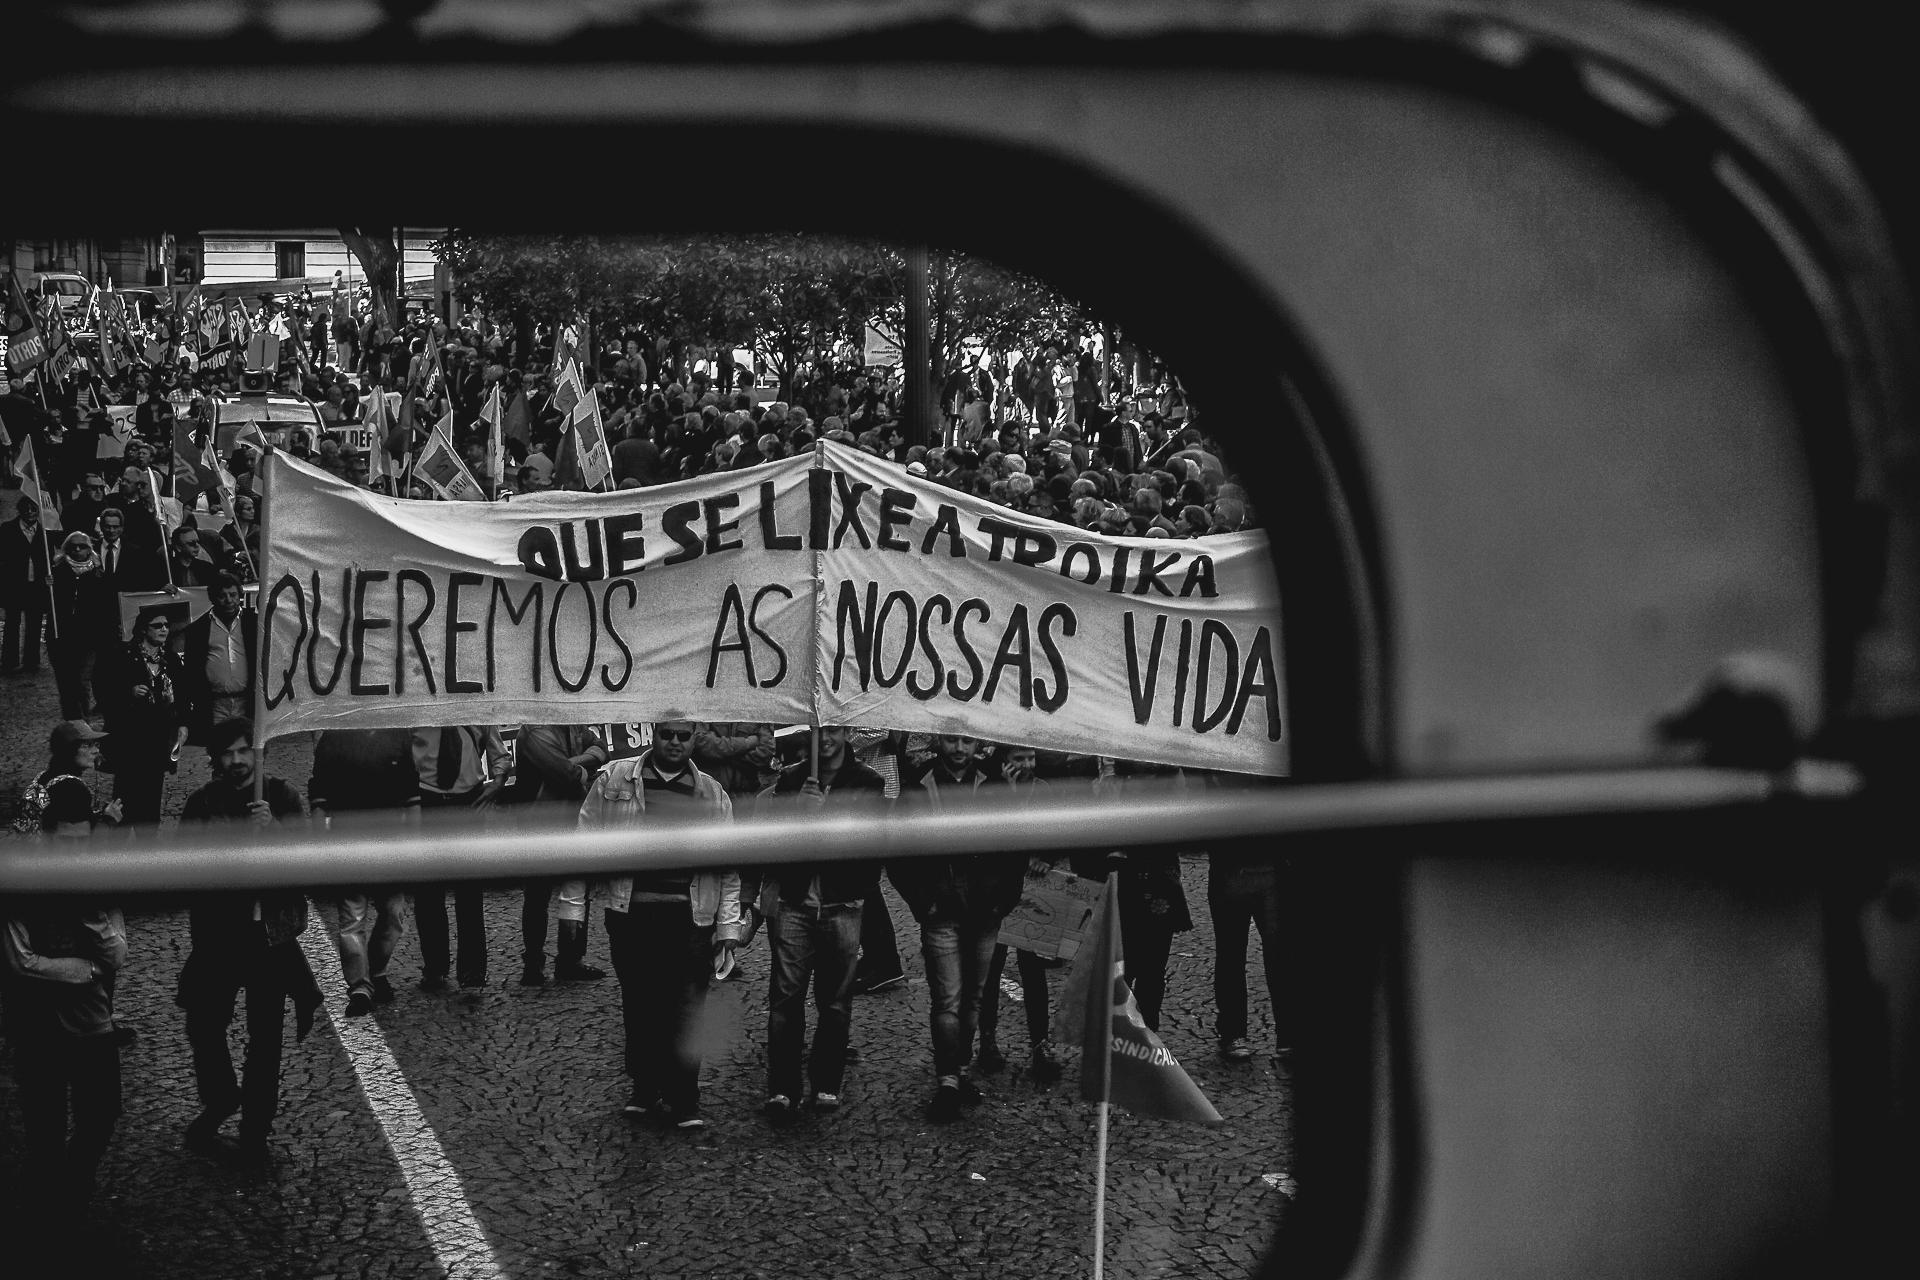 Manifestacao March Rally Photography Fotografia bonjourmolotov Andre Gigante 03